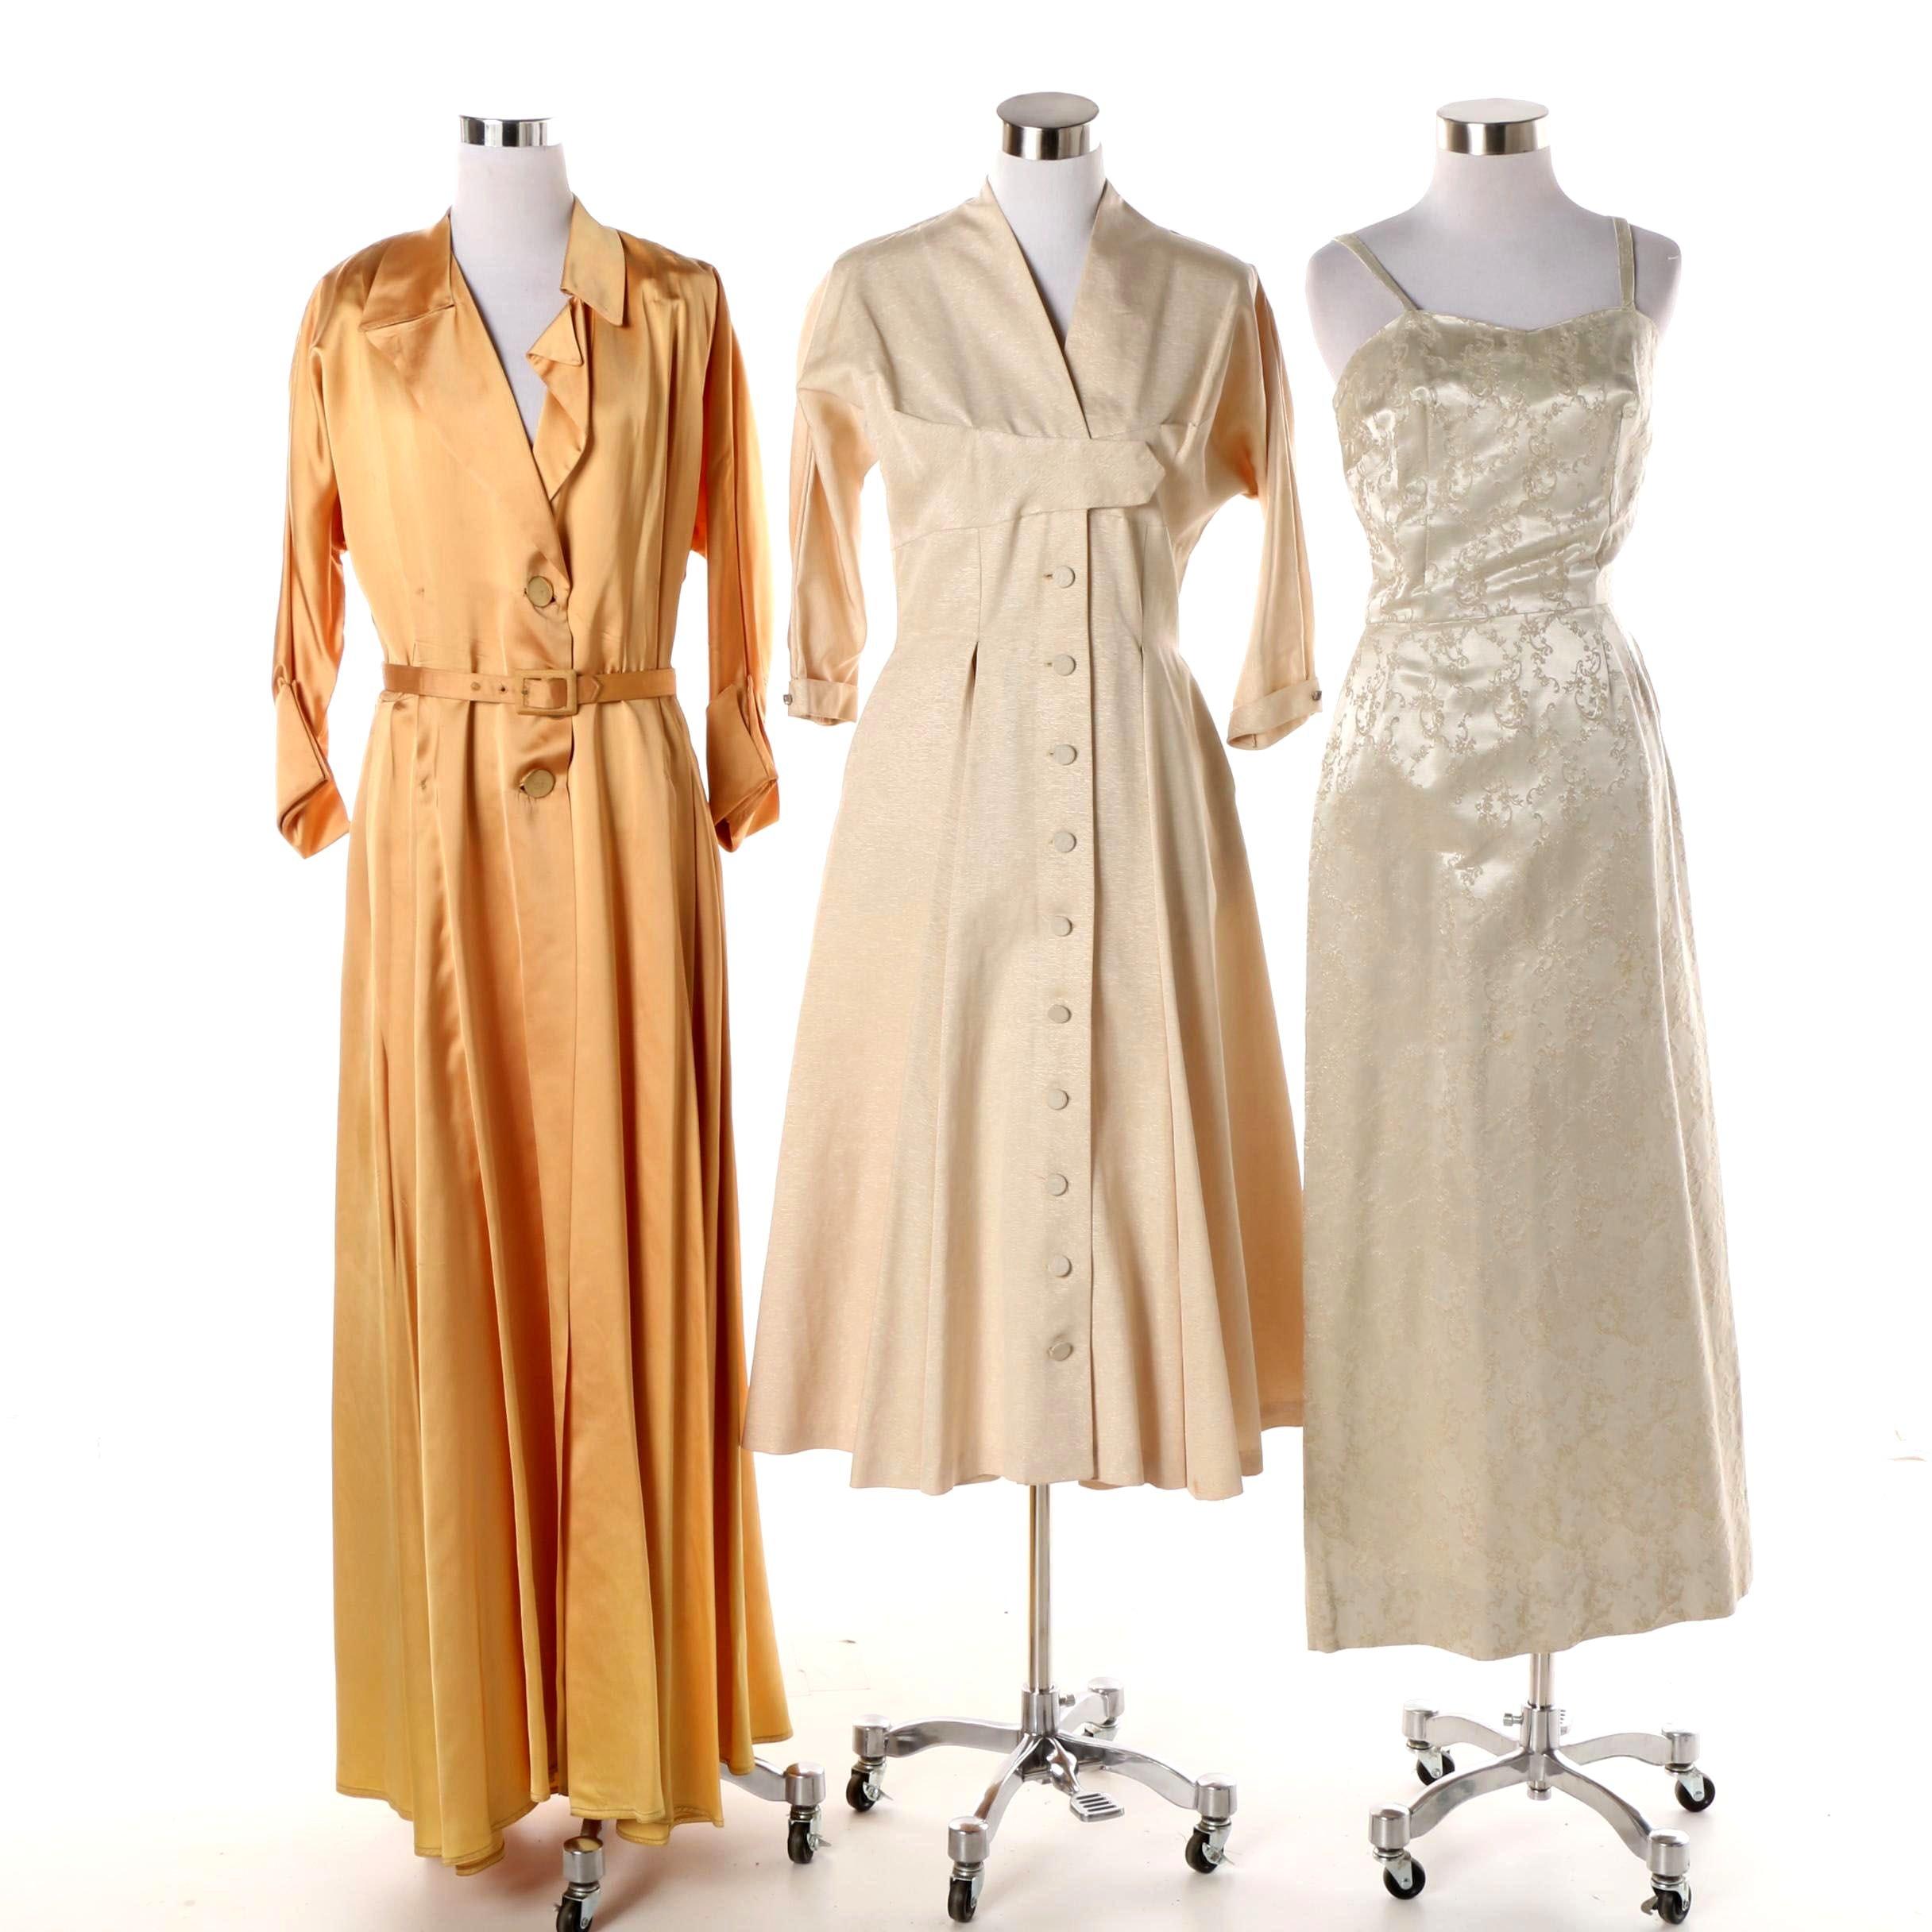 Women's Vintage Coat Dresses and Sheath Including Réloms and B. Cohen Original